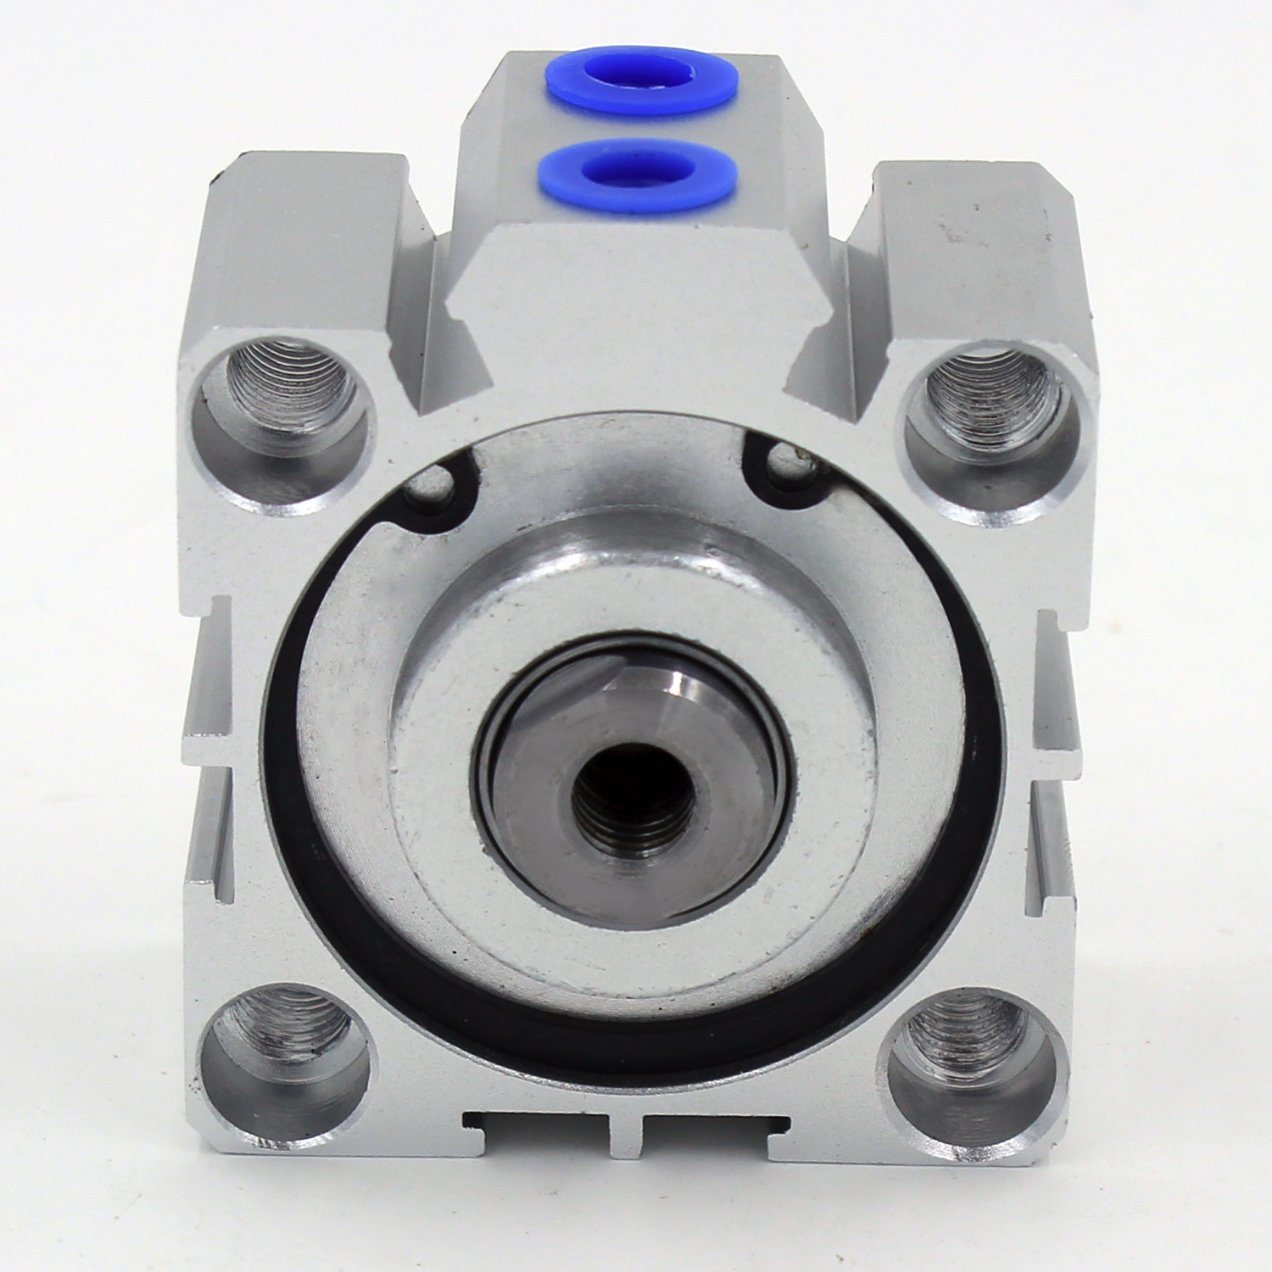 Dopow Sda Series Compact Pneumatic Cylinde (SDA40-5)